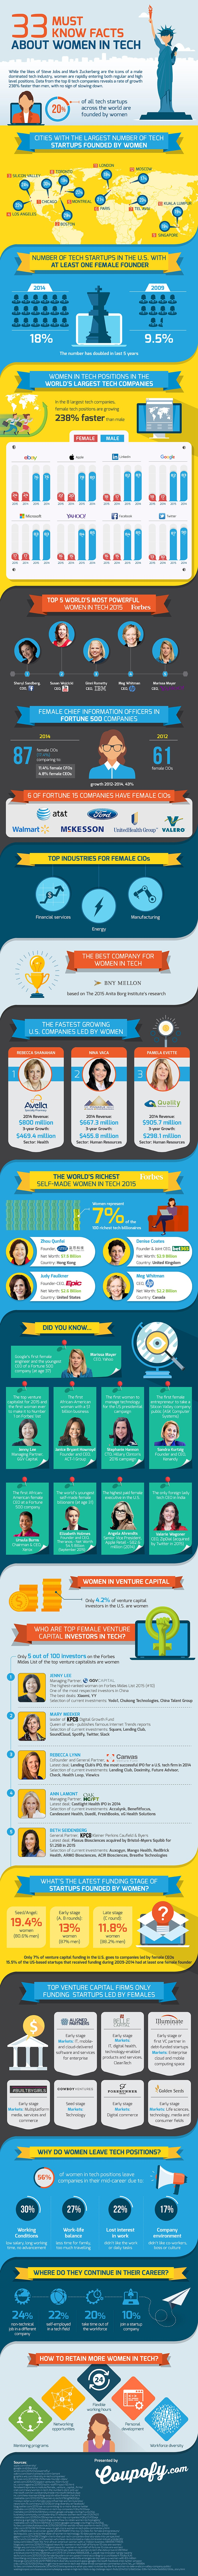 women-in-tech-infographic.jpg